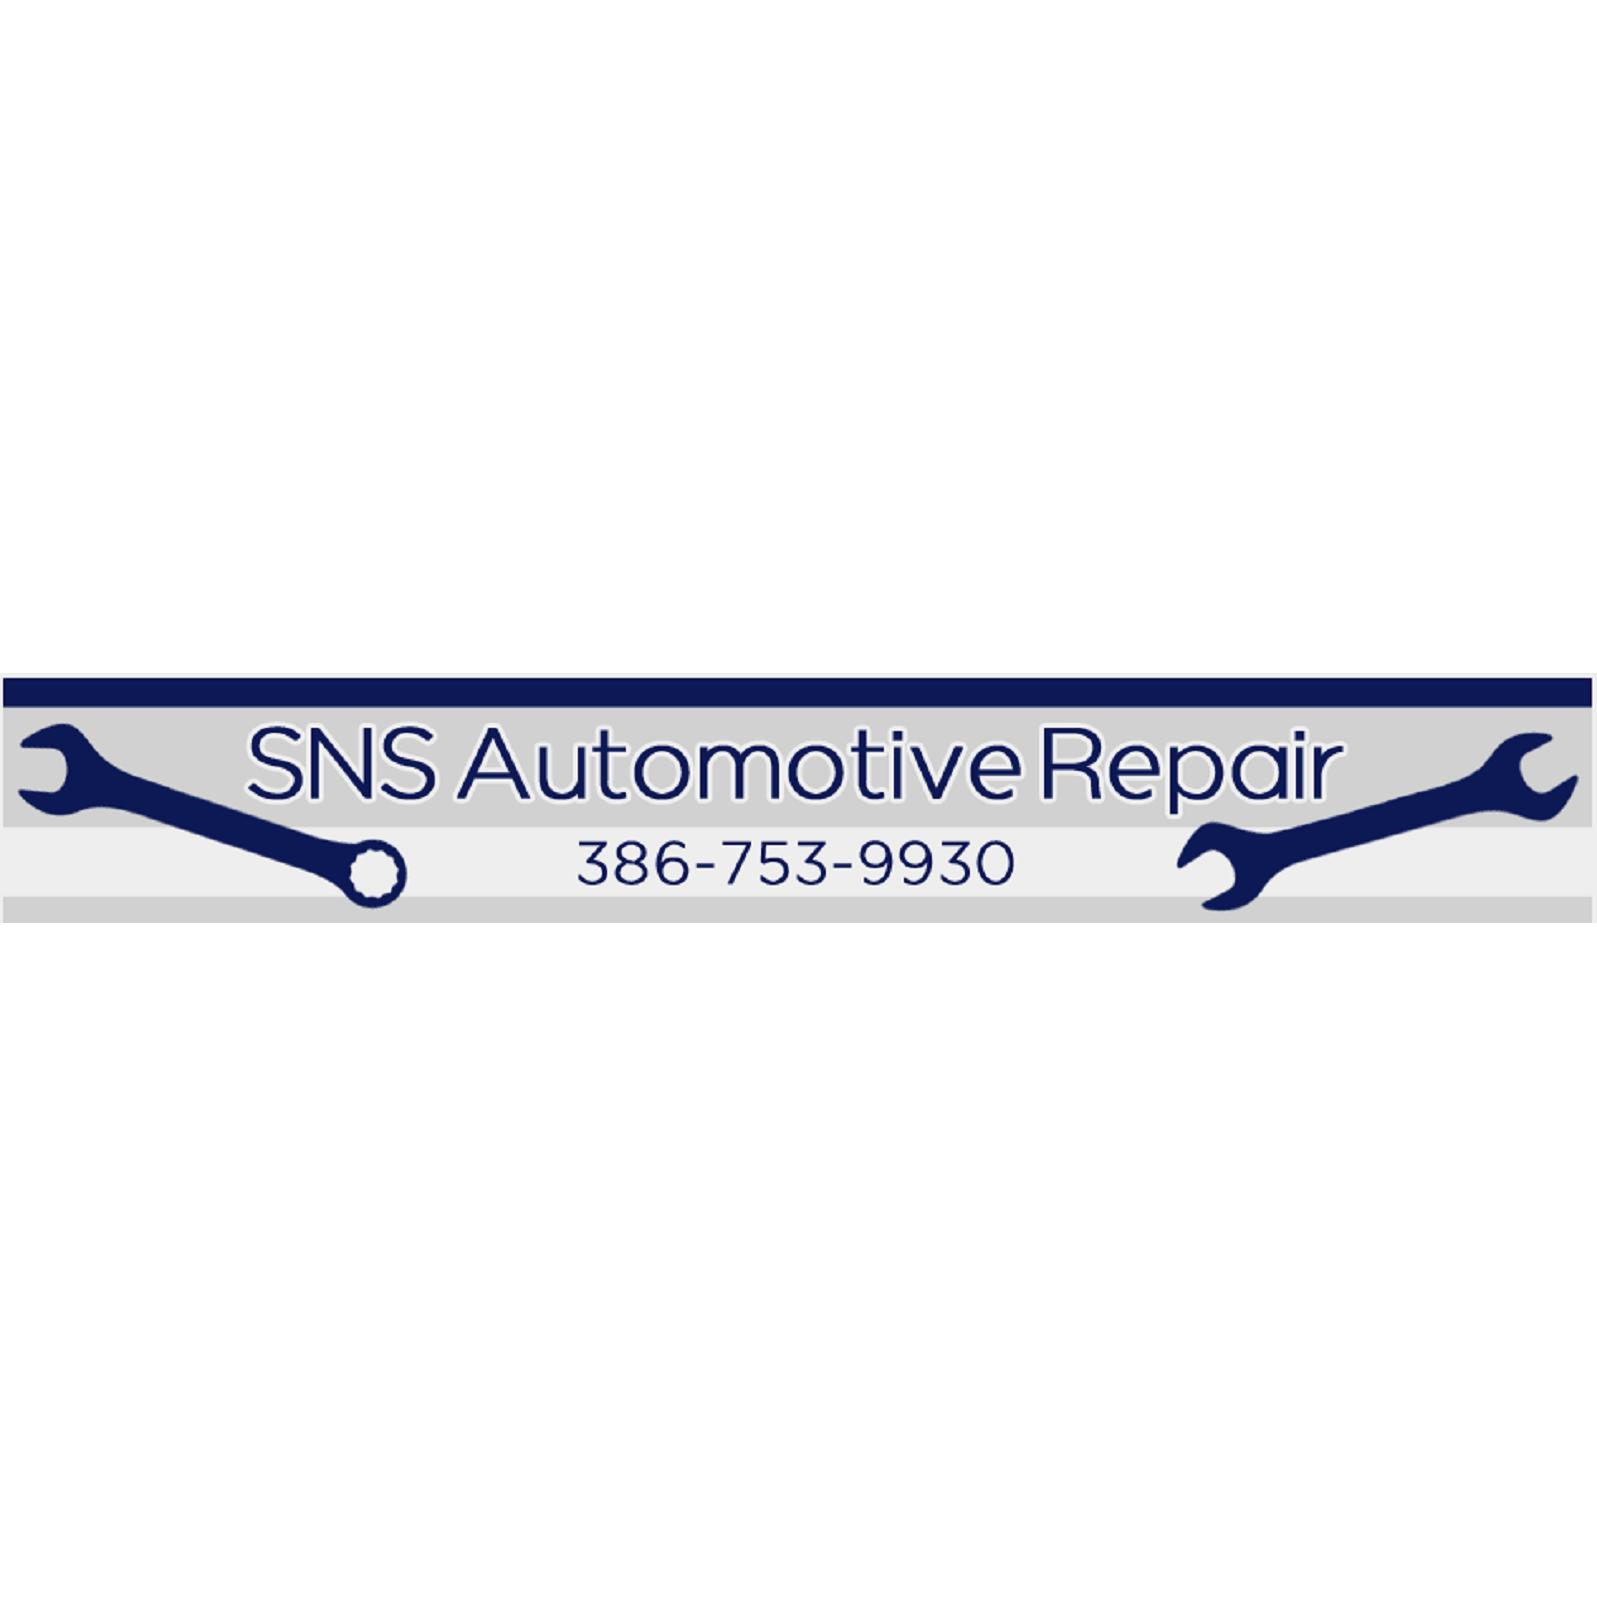 SNS Automotive Repair